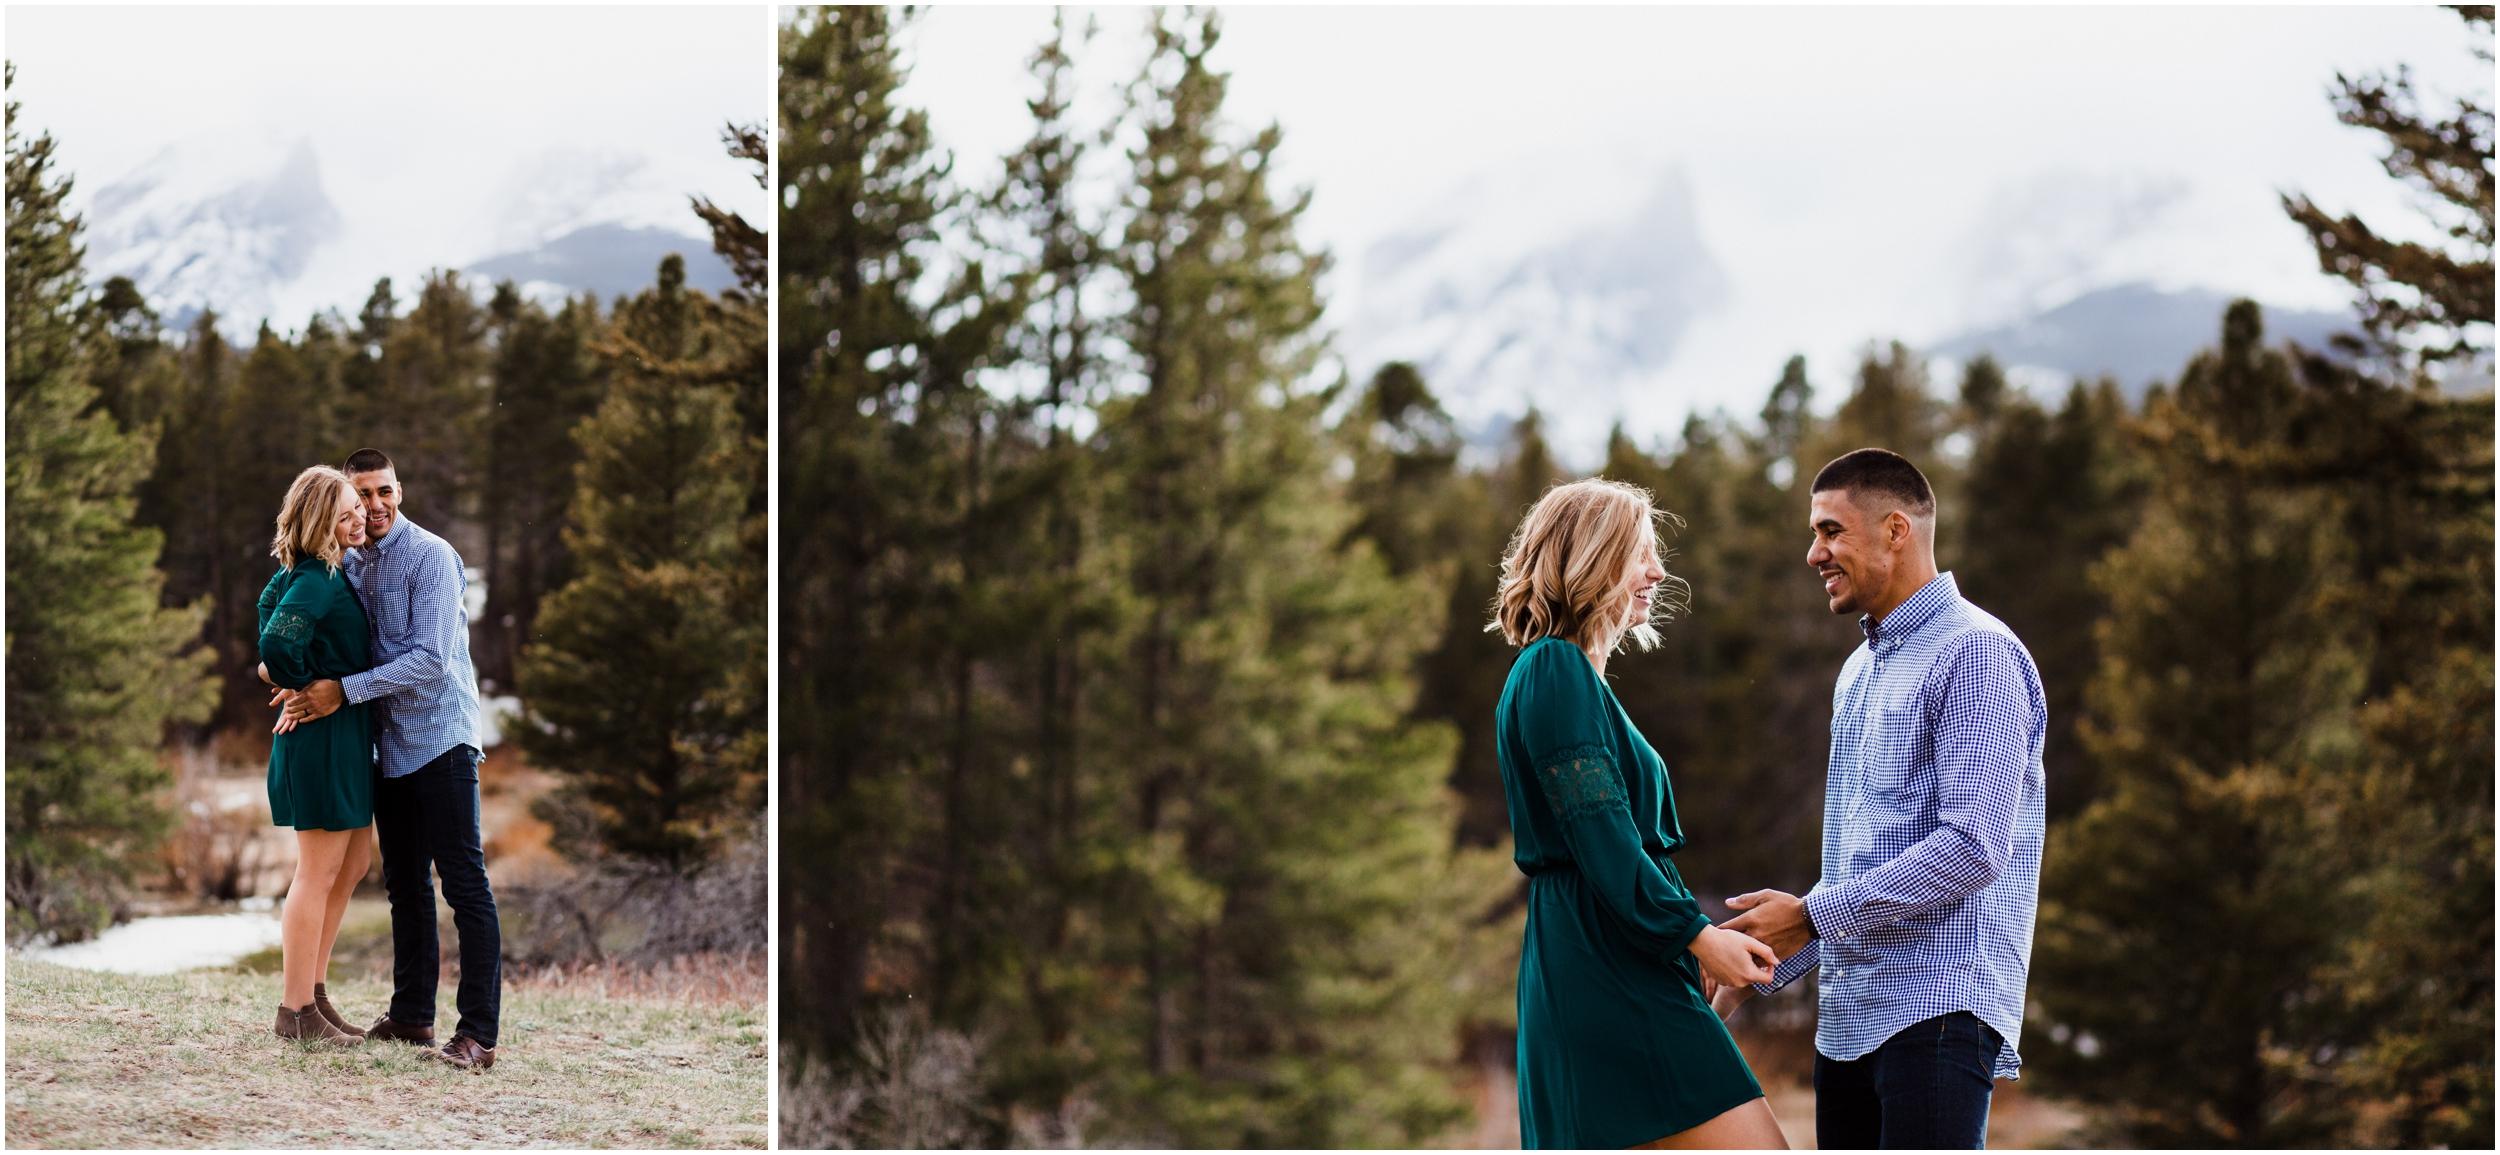 rocky-mountain-national-park-elopement-sprague-lake-colorado-adventure-wedding-photographer_taylor-powers_82.jpg